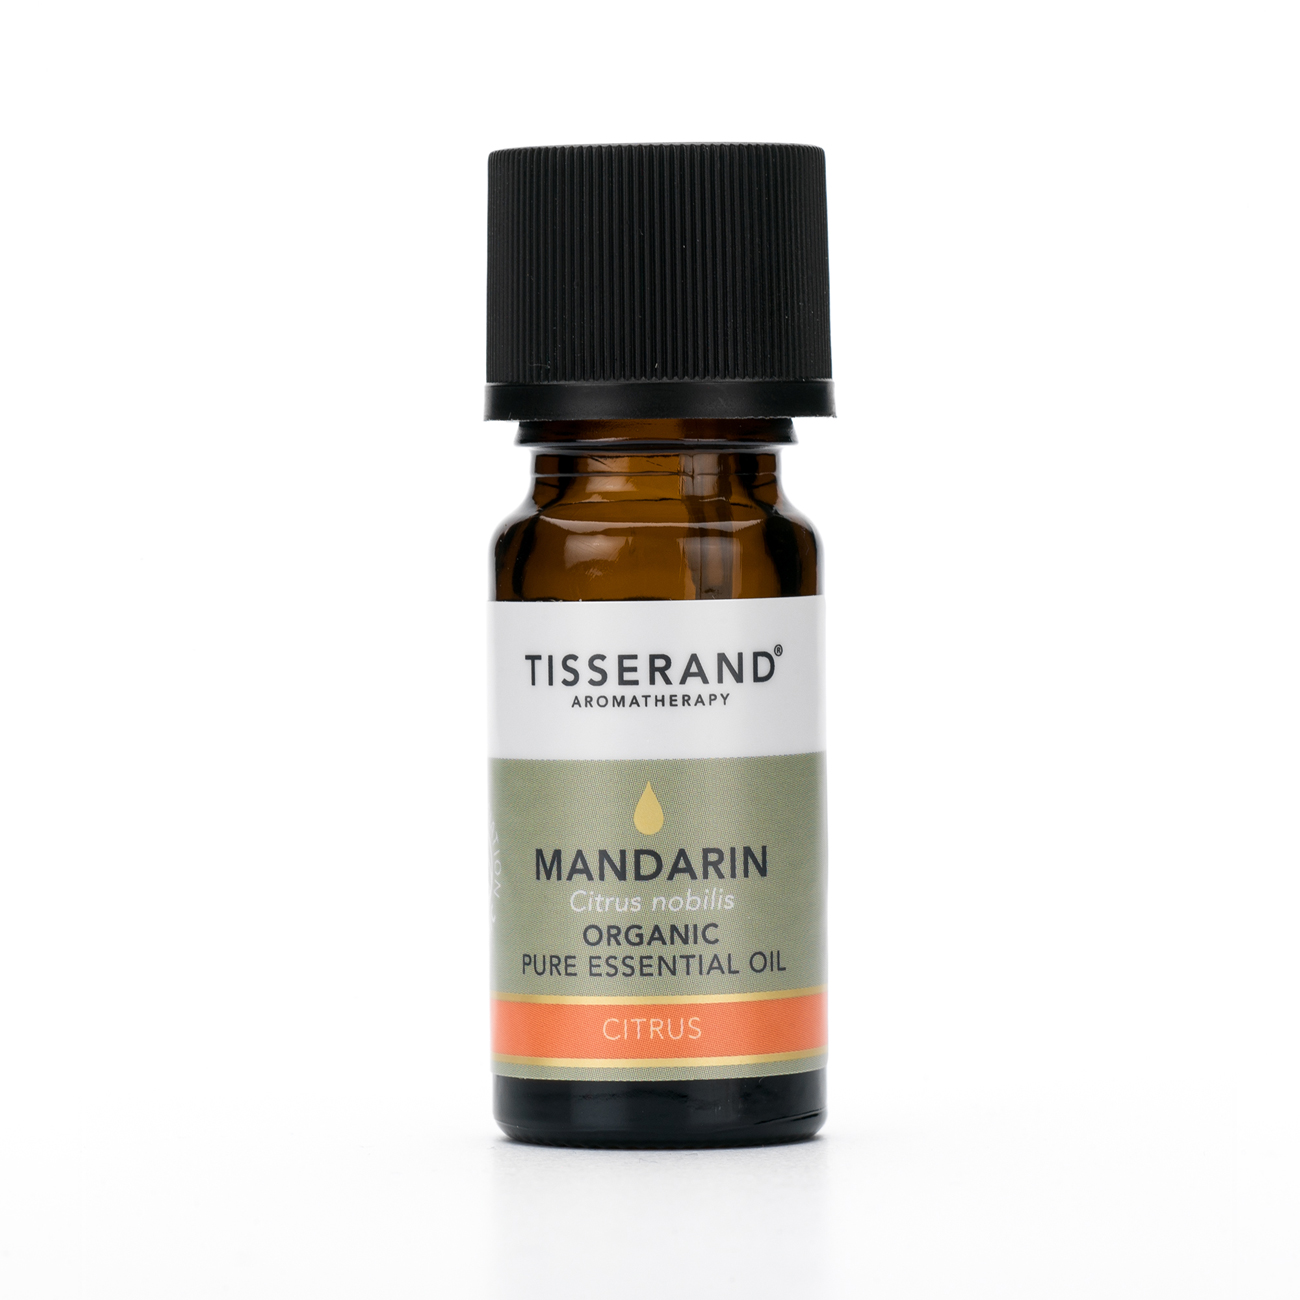 Mandarin Organic Pure Essential Oil 9ml